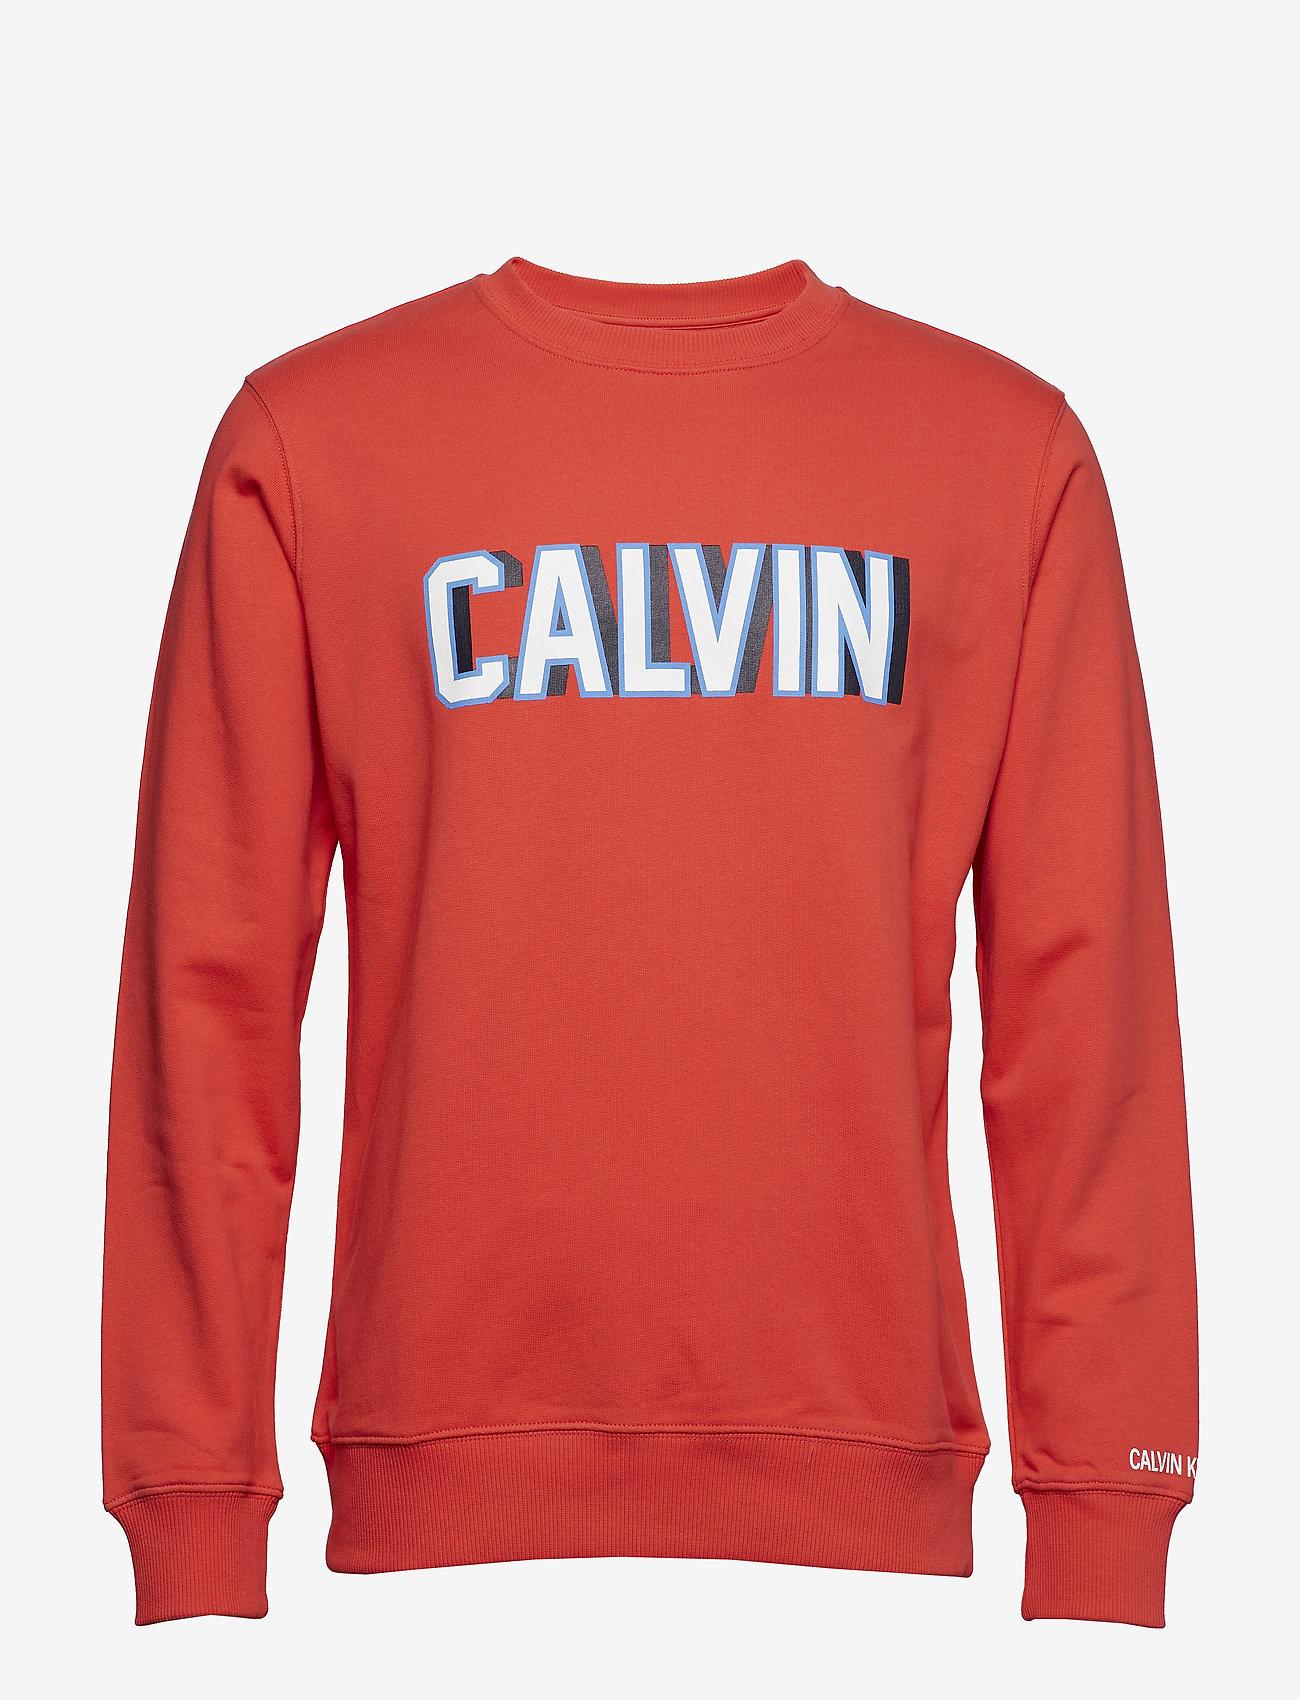 Calvin Klein Jeans - CALVIN LOGO CREW NECK - sweatshirts - tomato